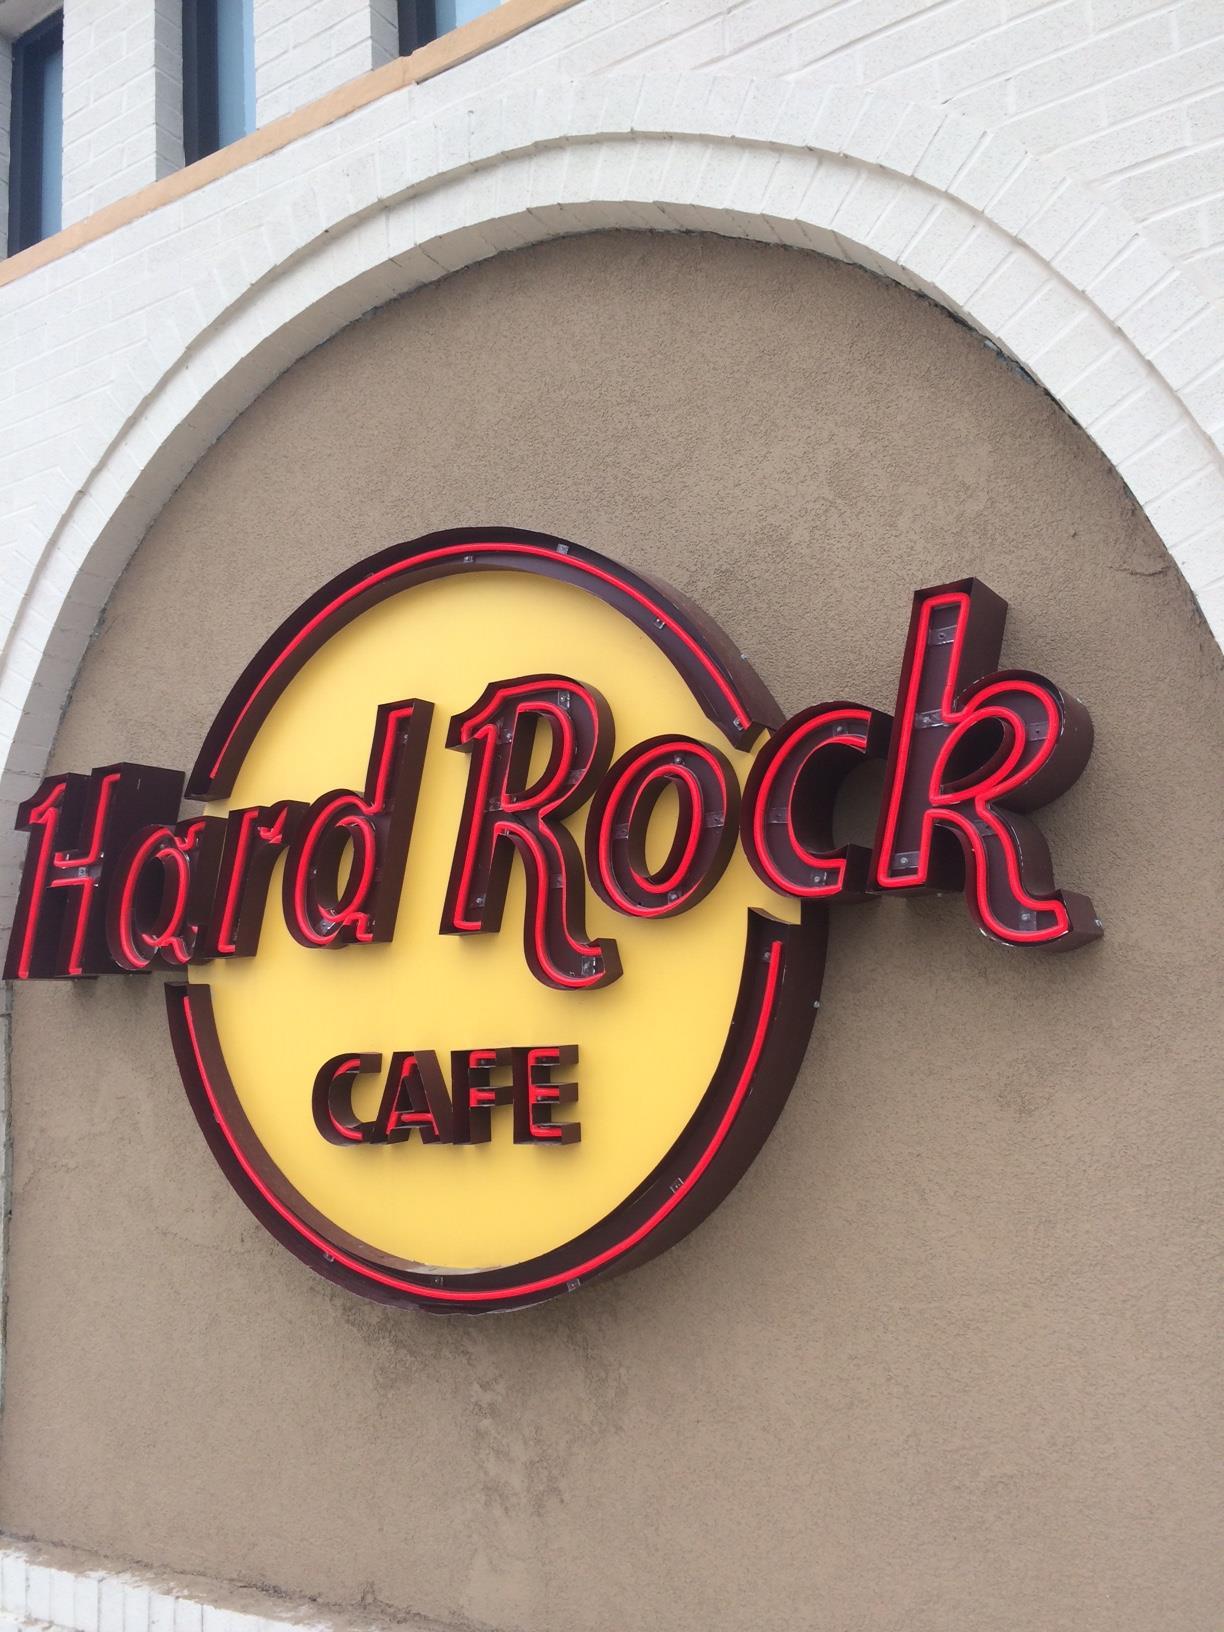 hardrockcafe.png